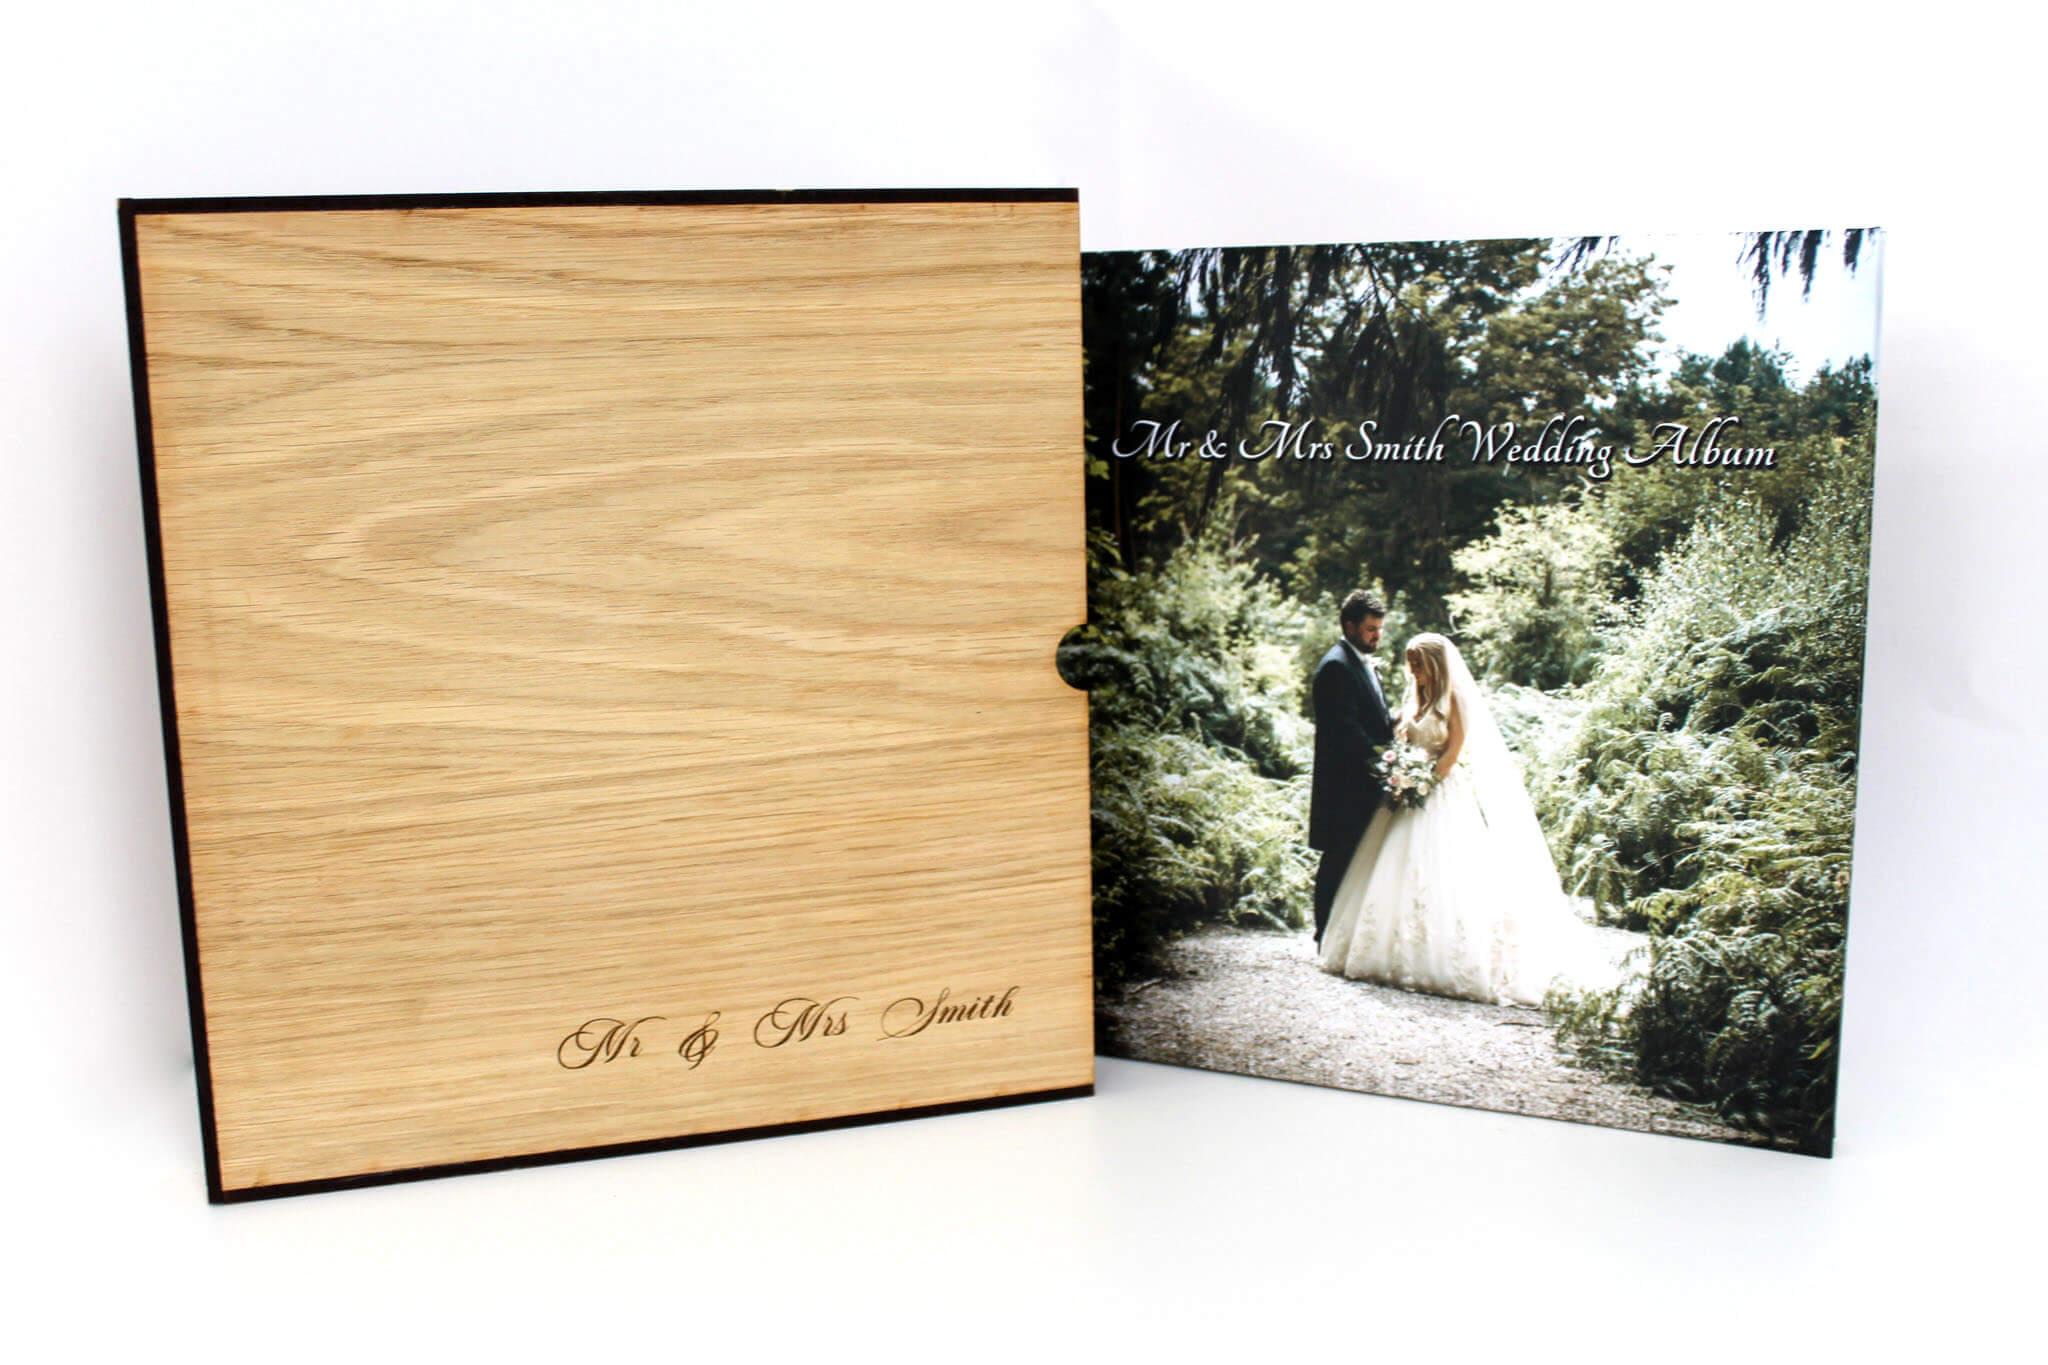 Bespoke wedding album presentation box Manchester